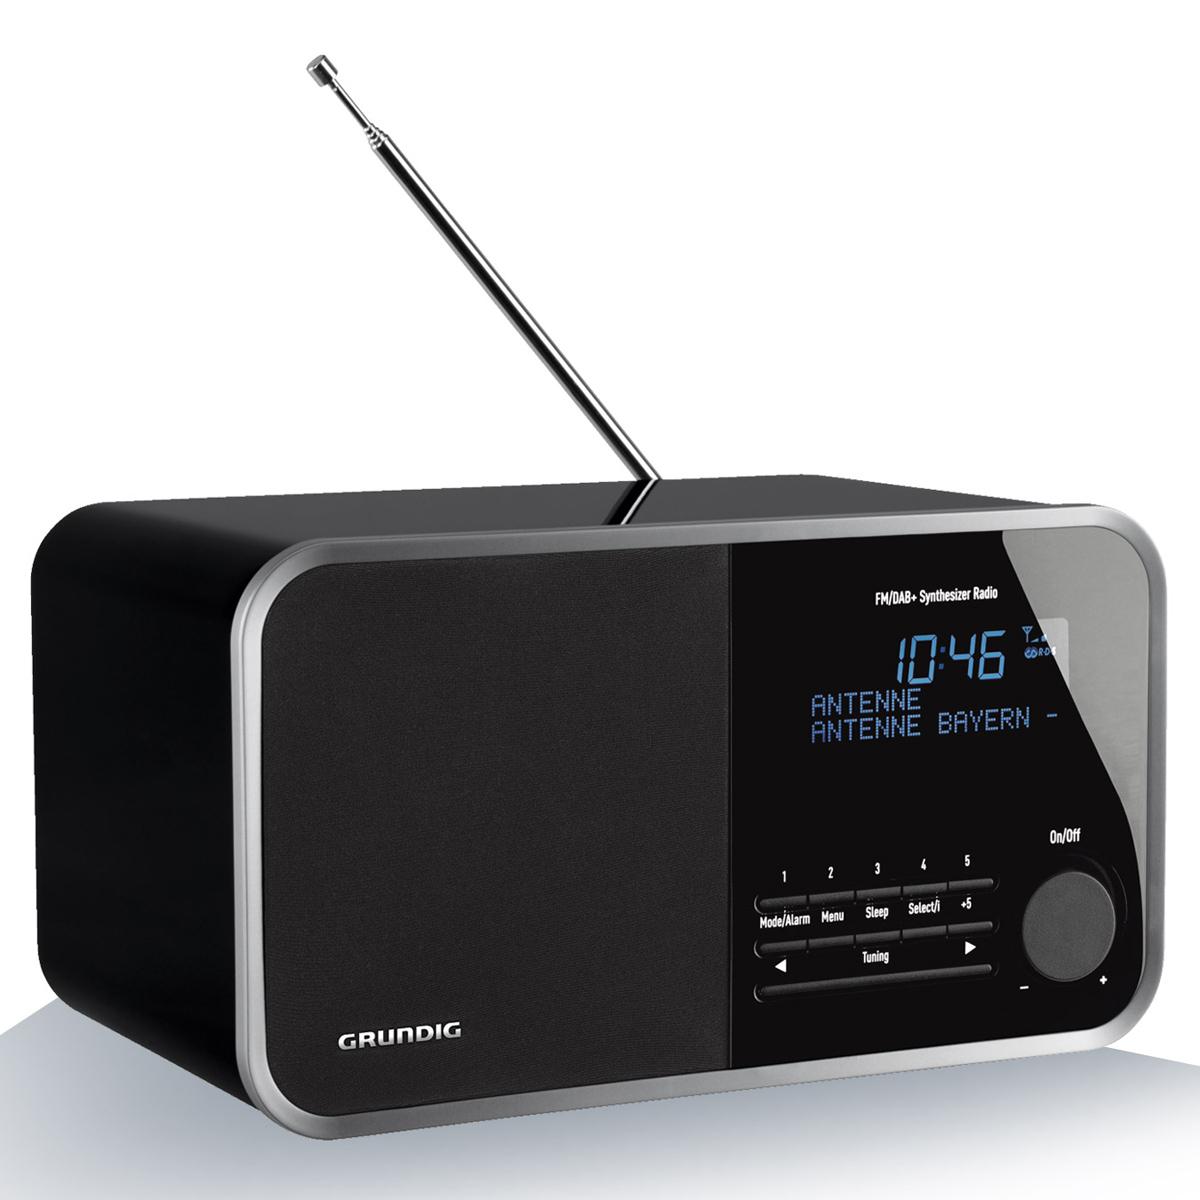 grundig tr 2200 dab noir radio radio r veil grundig. Black Bedroom Furniture Sets. Home Design Ideas